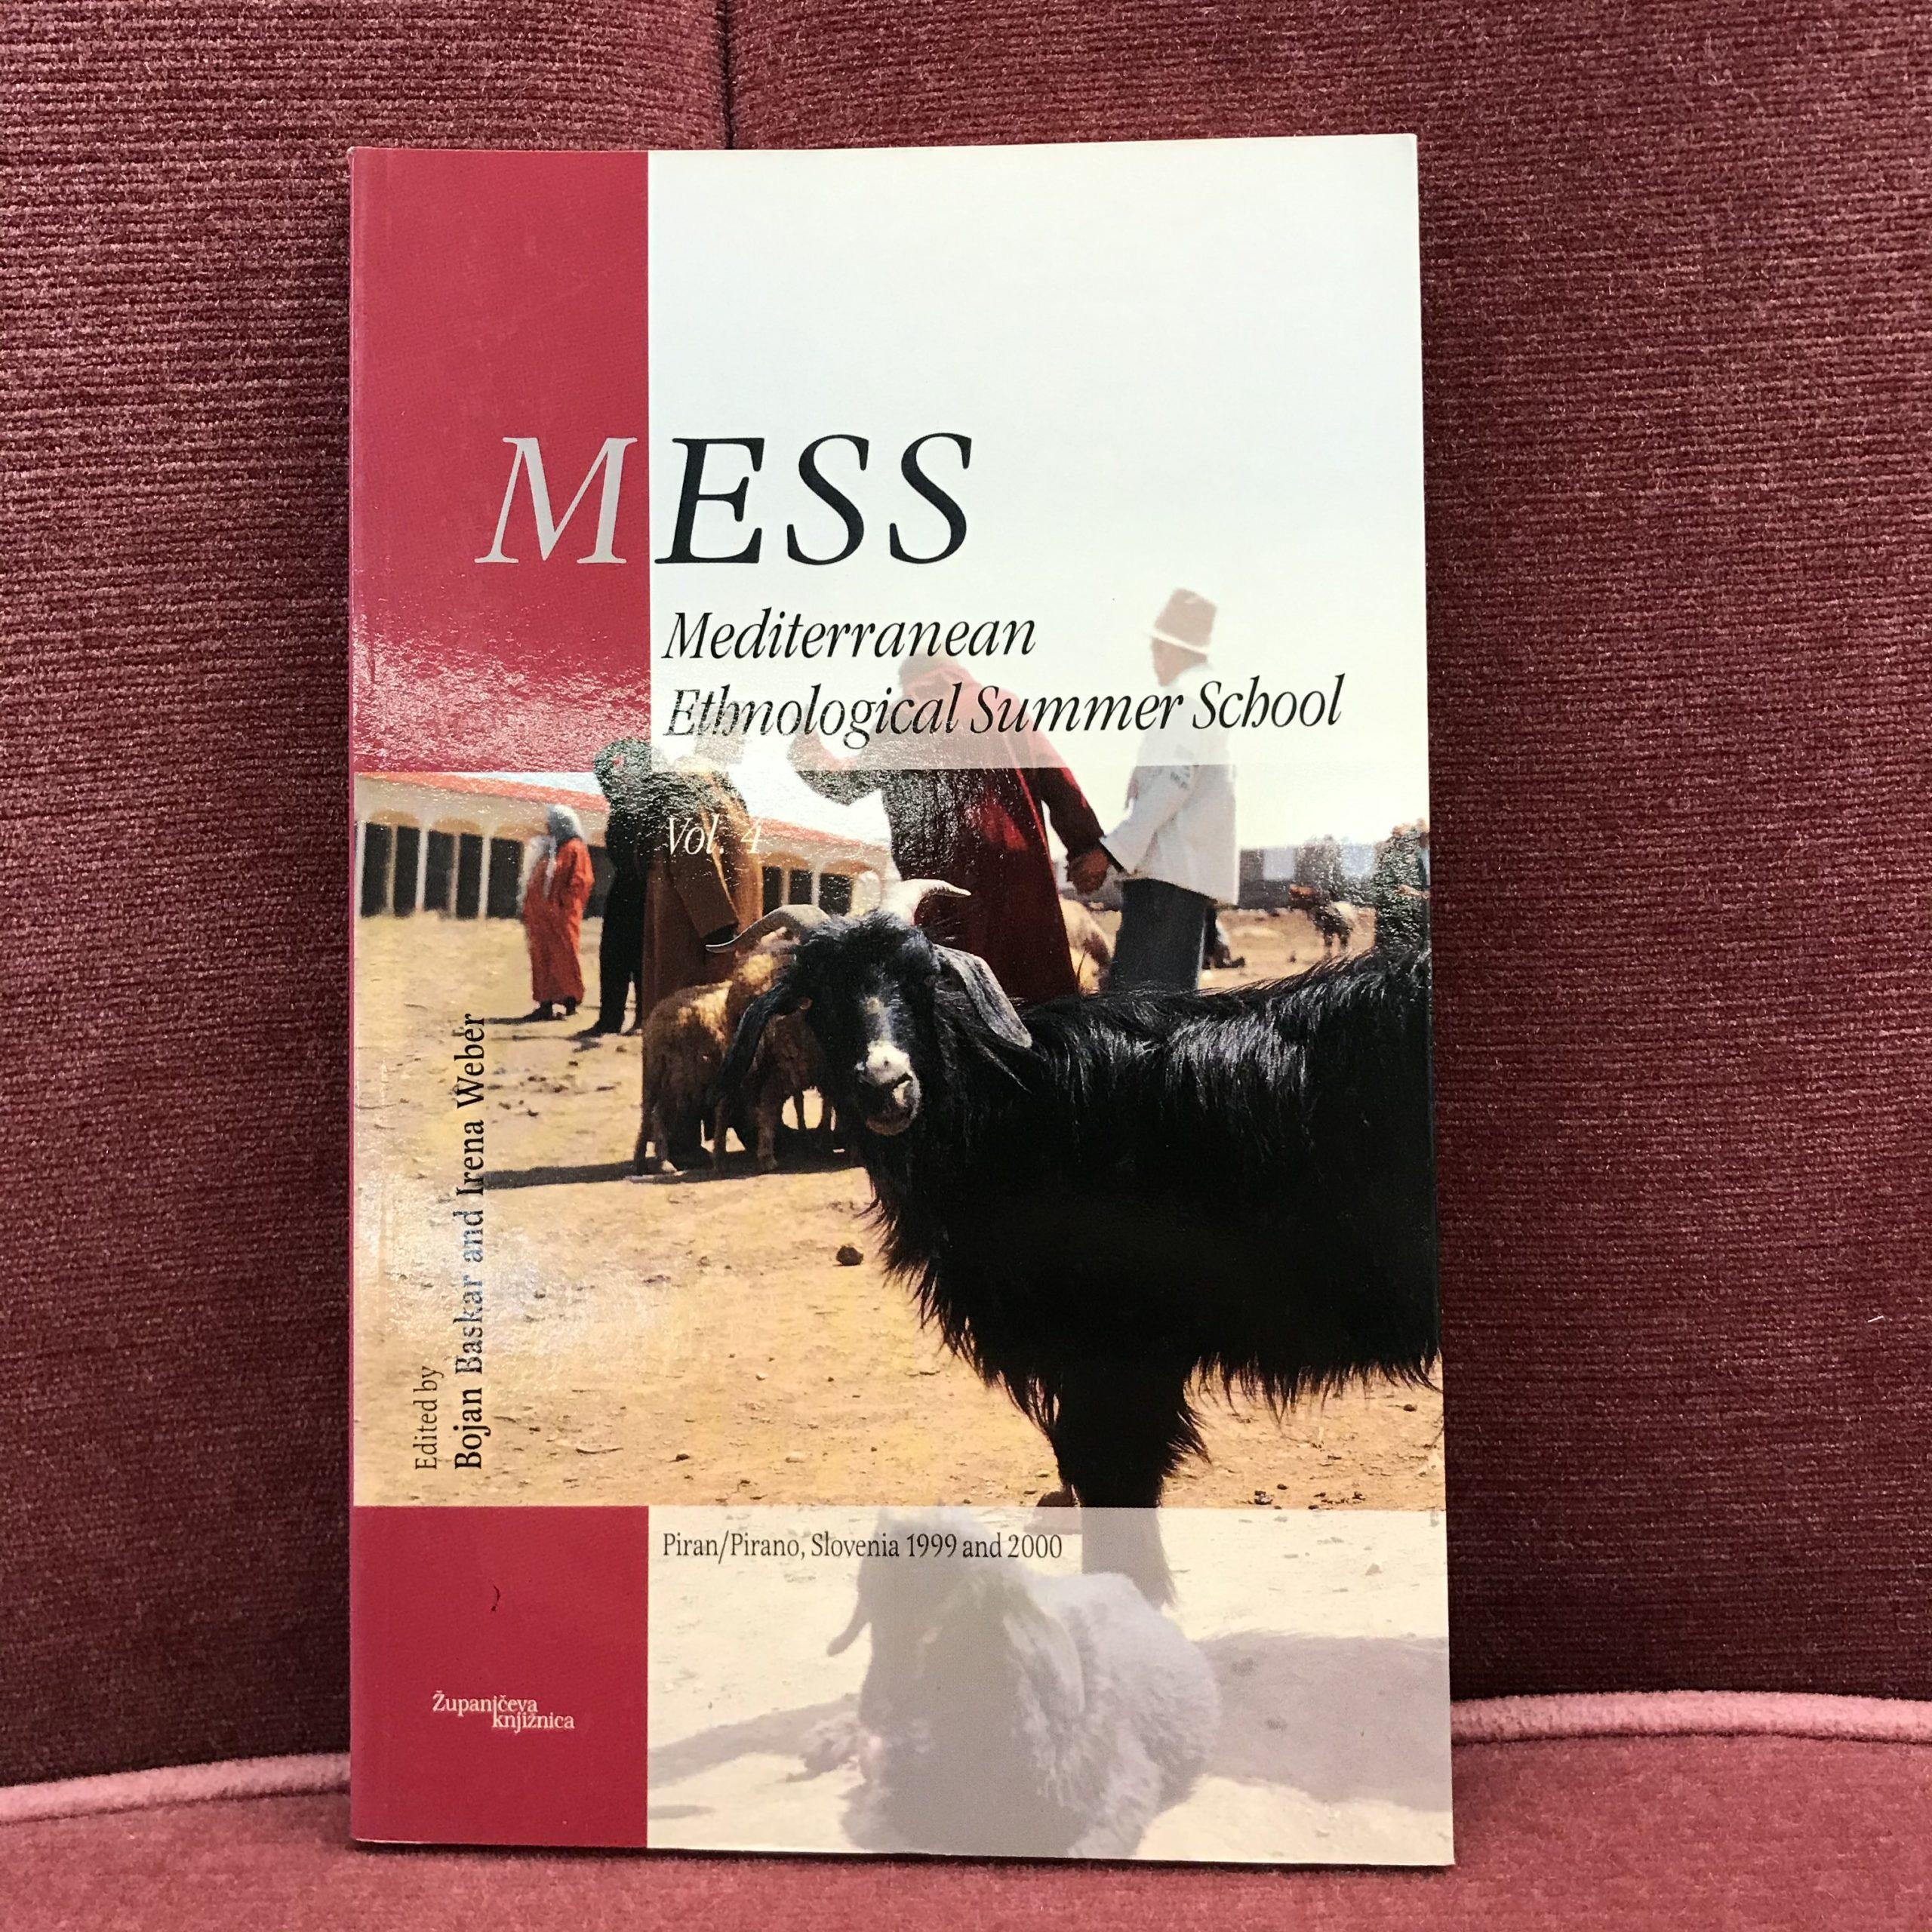 MESS- Mediterranean Ethnological Summer School Vol.4